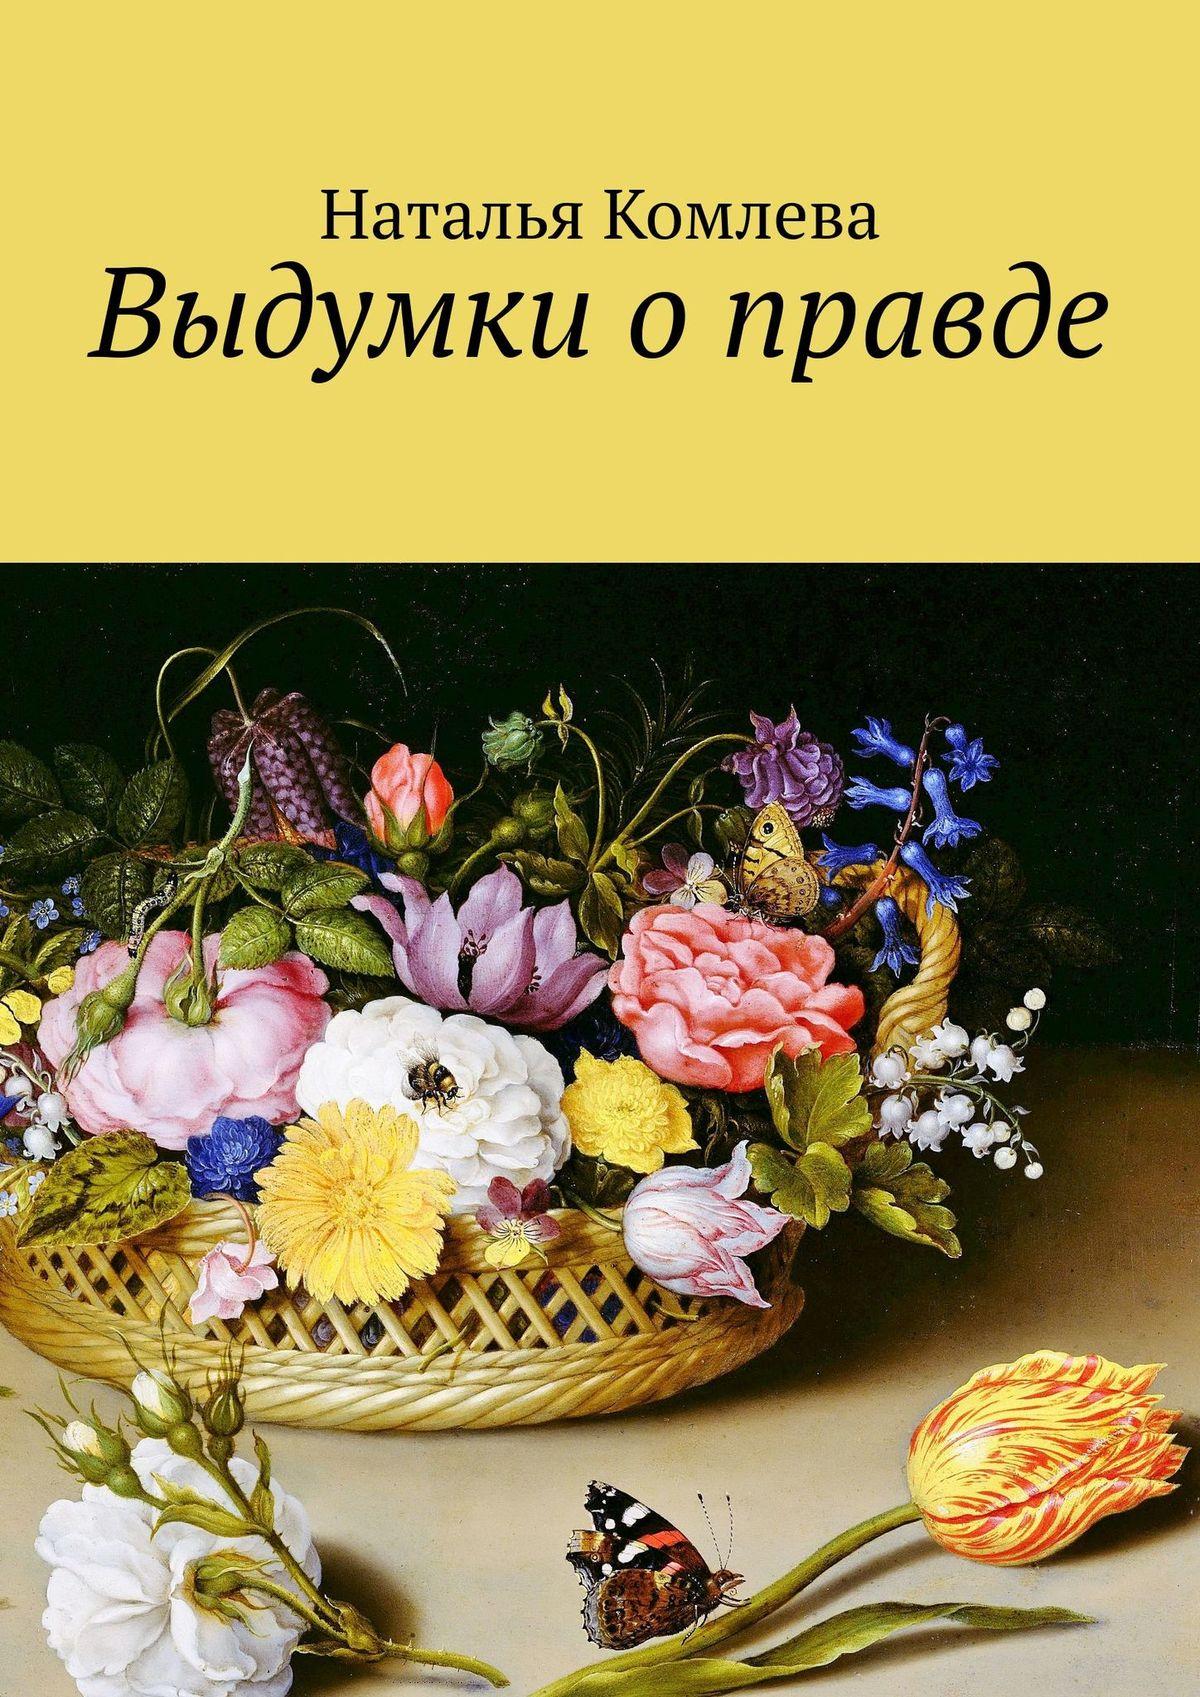 Сказки о правде_Наталья Комлева